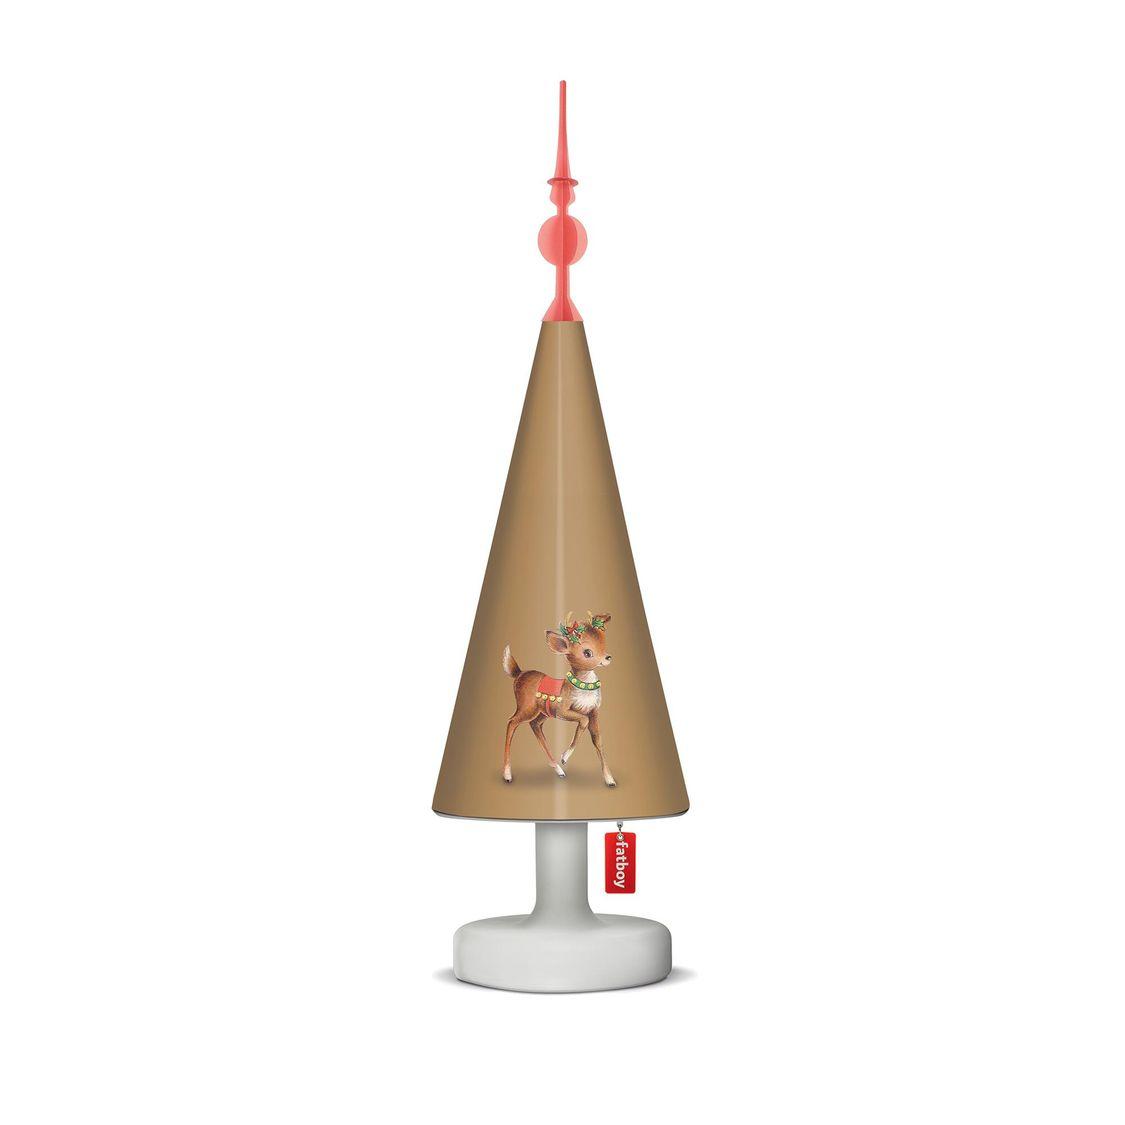 Inspirierend Fatboy Petit Referenz Von X-mas Edition Edison The Lamp